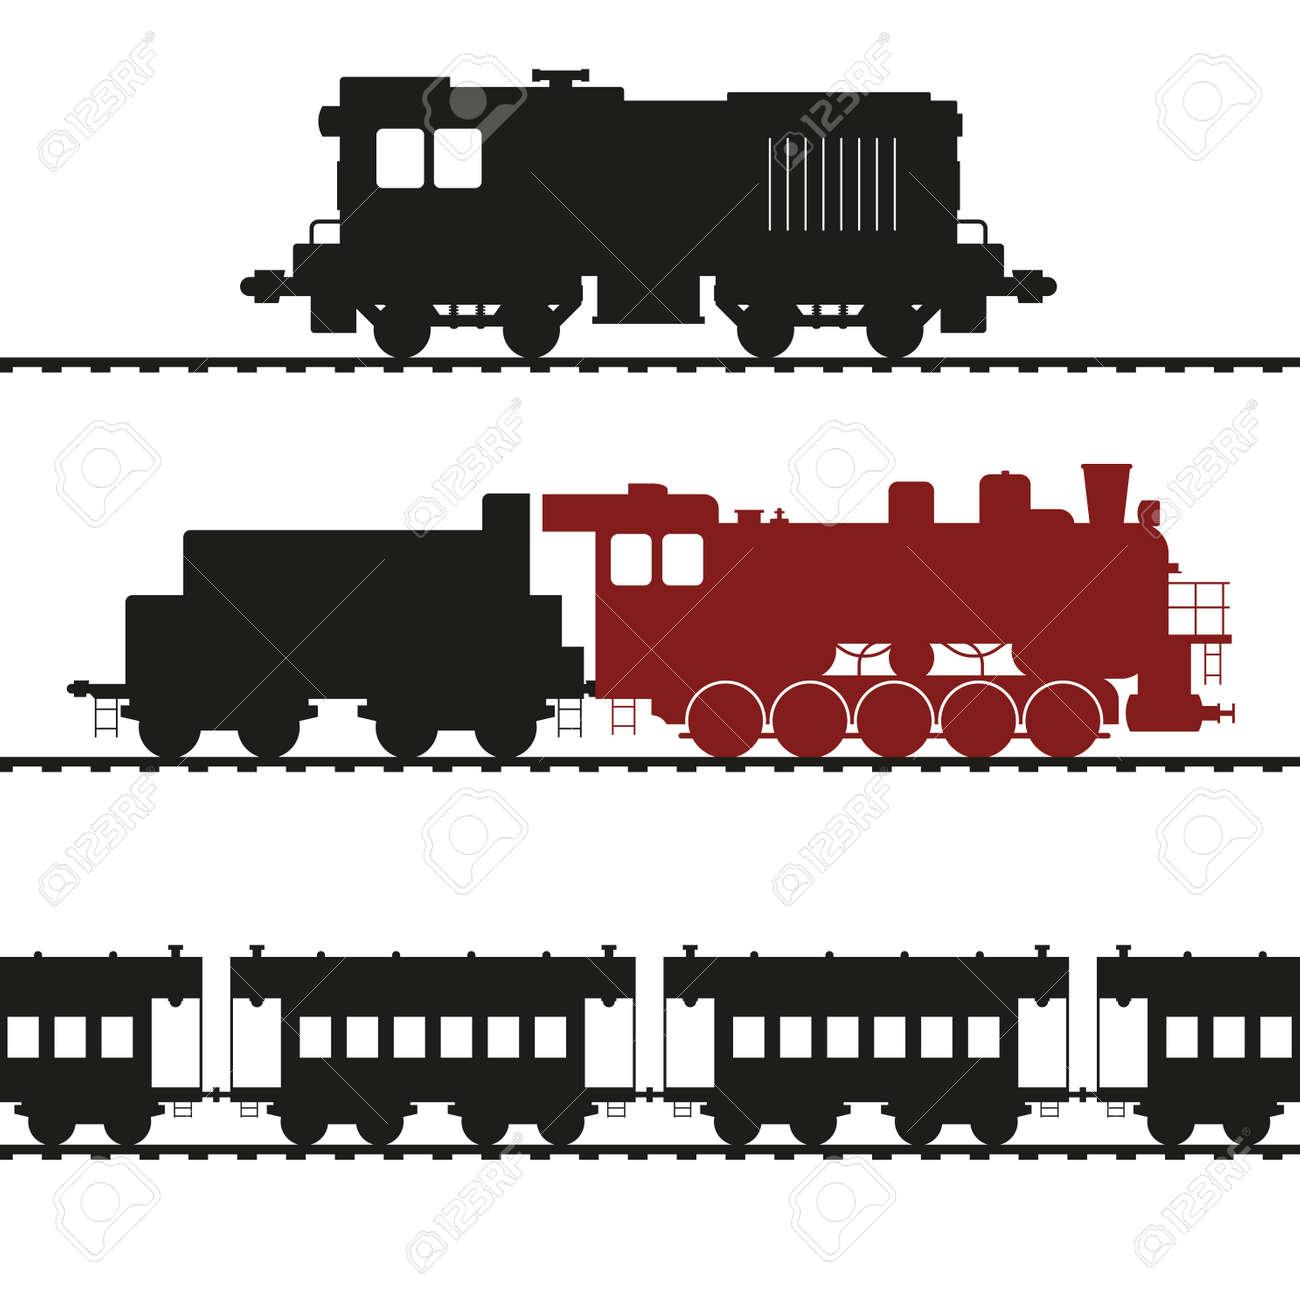 Old locomotives, shunting locomotive and steam locomotive with tender. Vintage wagons. Vector illustration. - 158111467